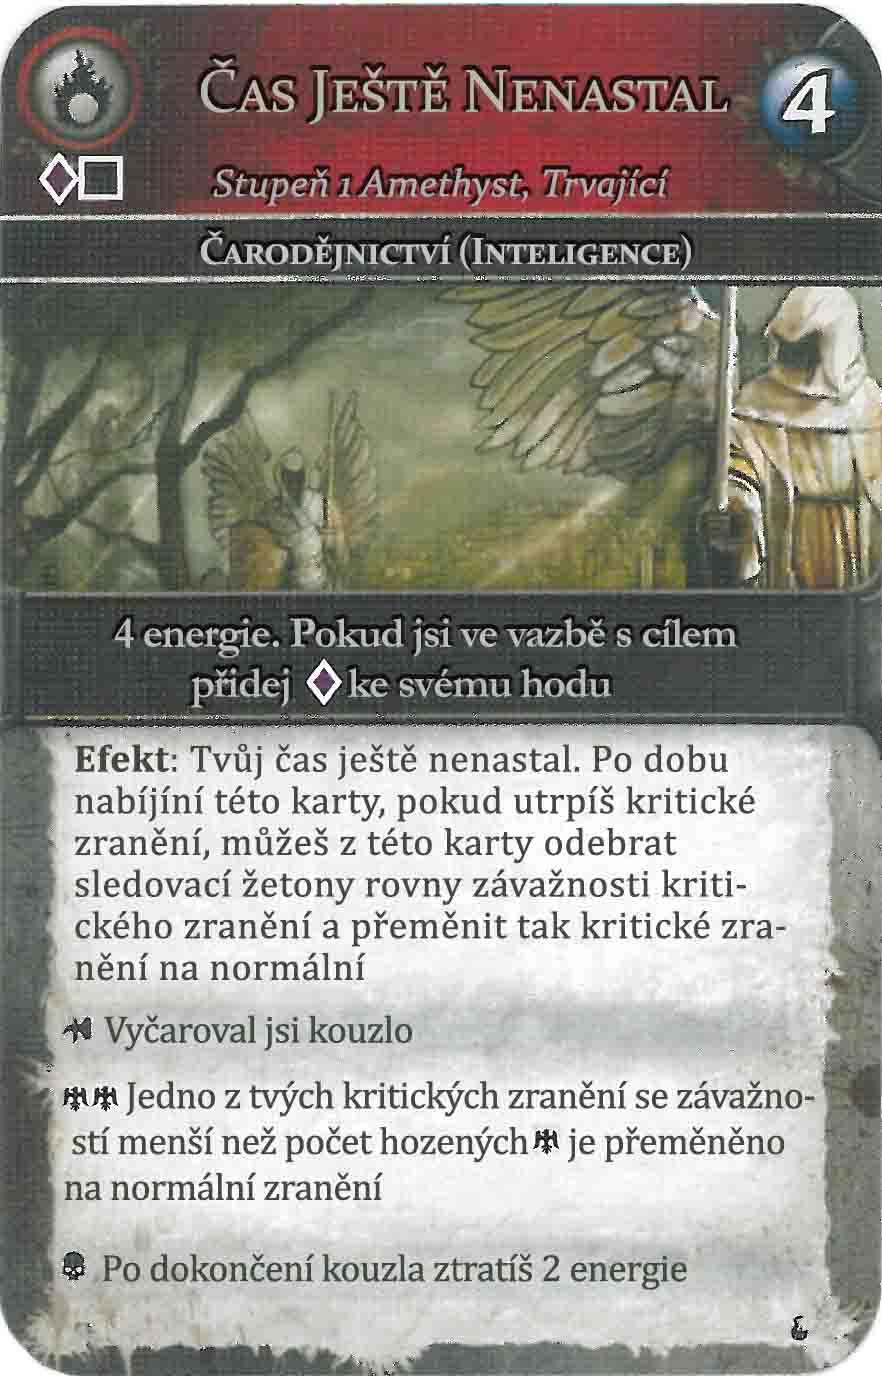 Wizard_-_jesteNenastalCas__cervena_.jpg